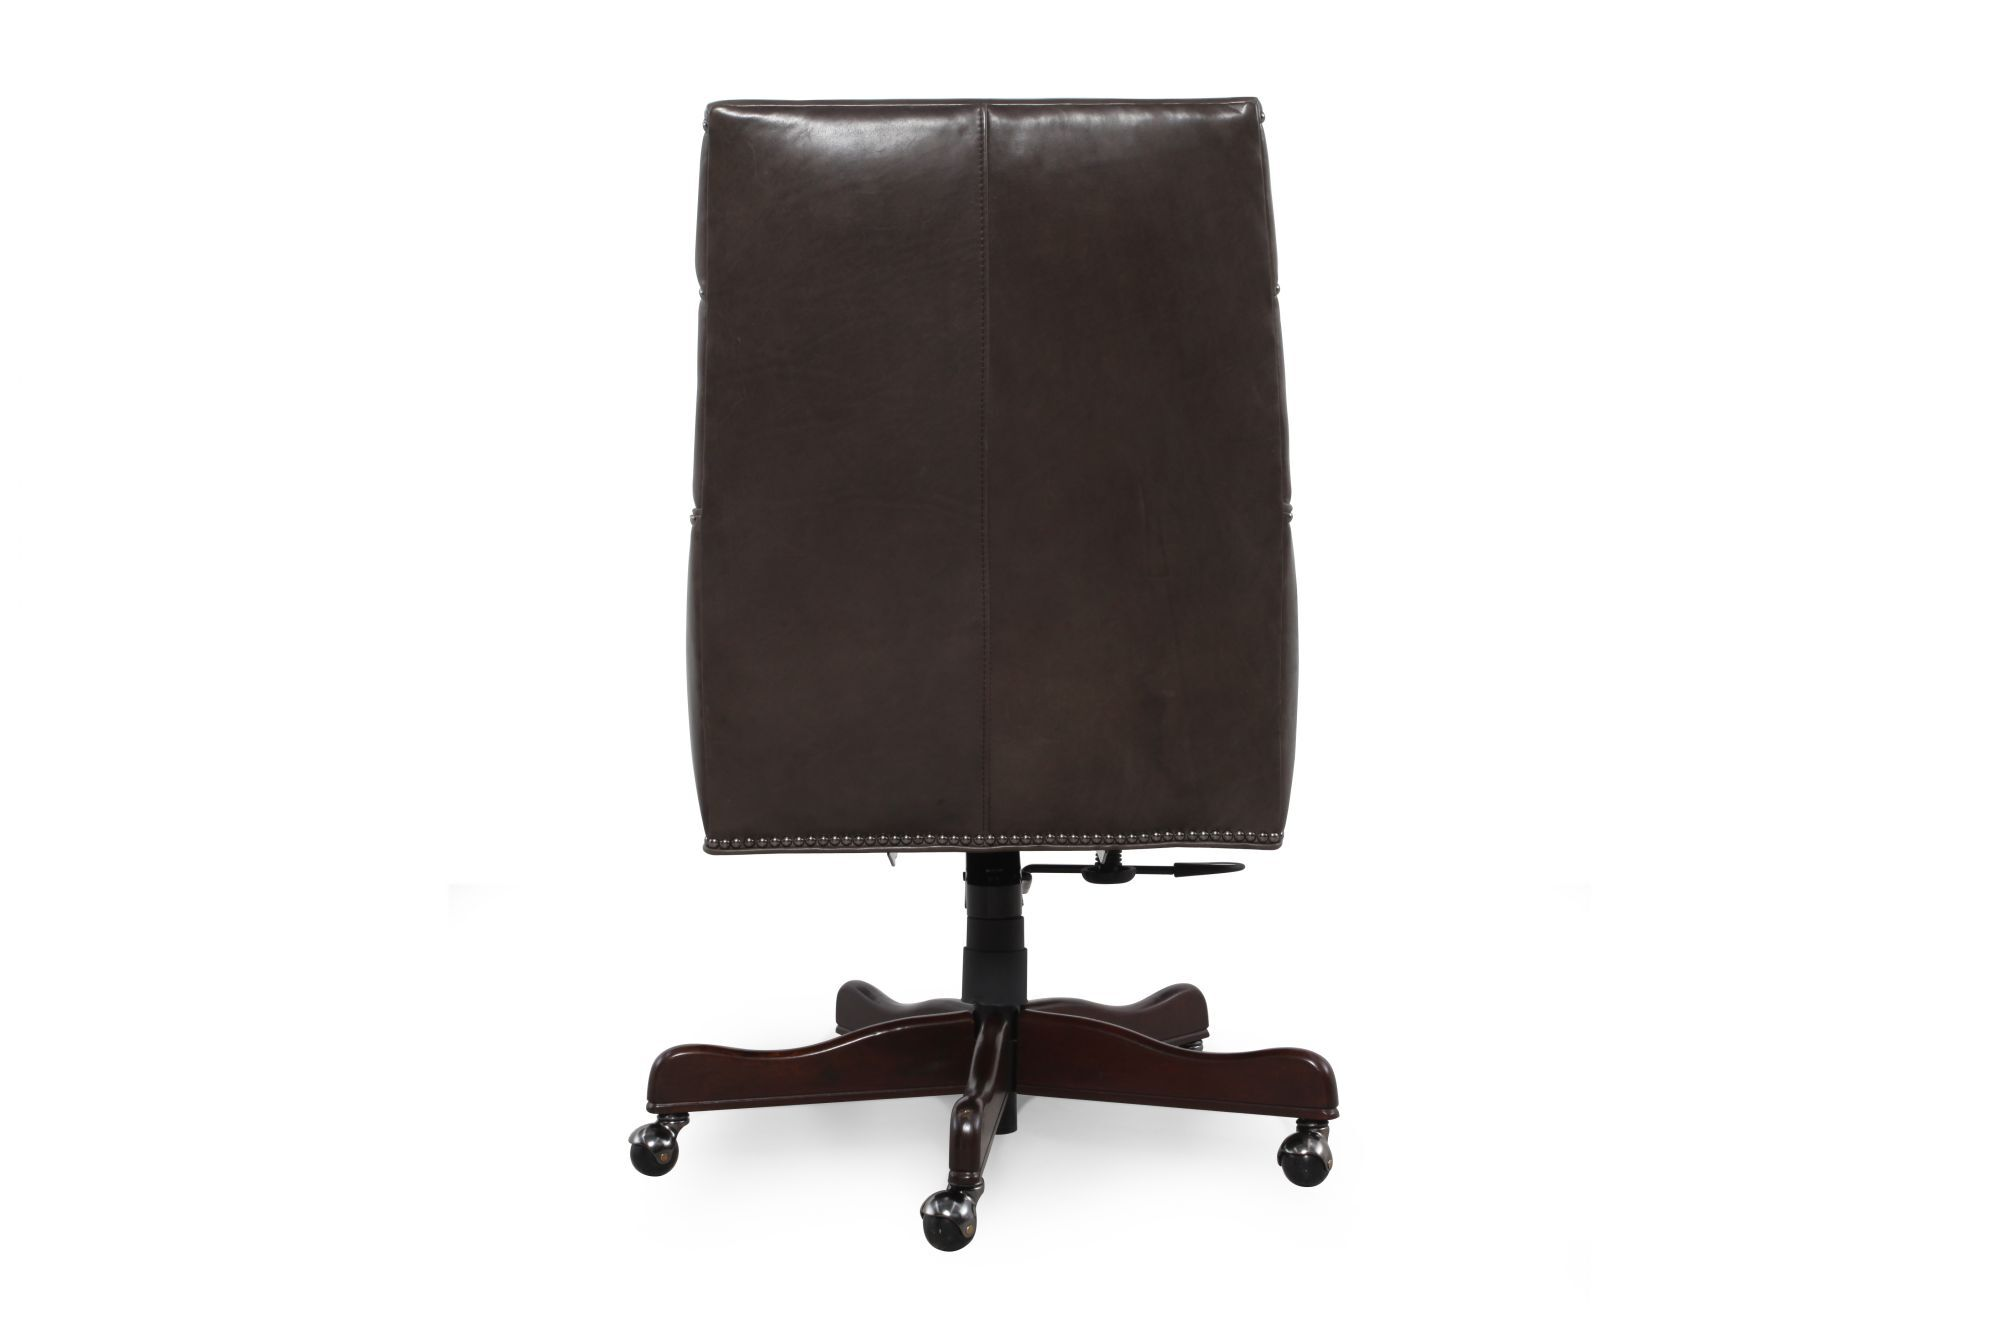 Hooker Seven Seas Executive Desk Chair